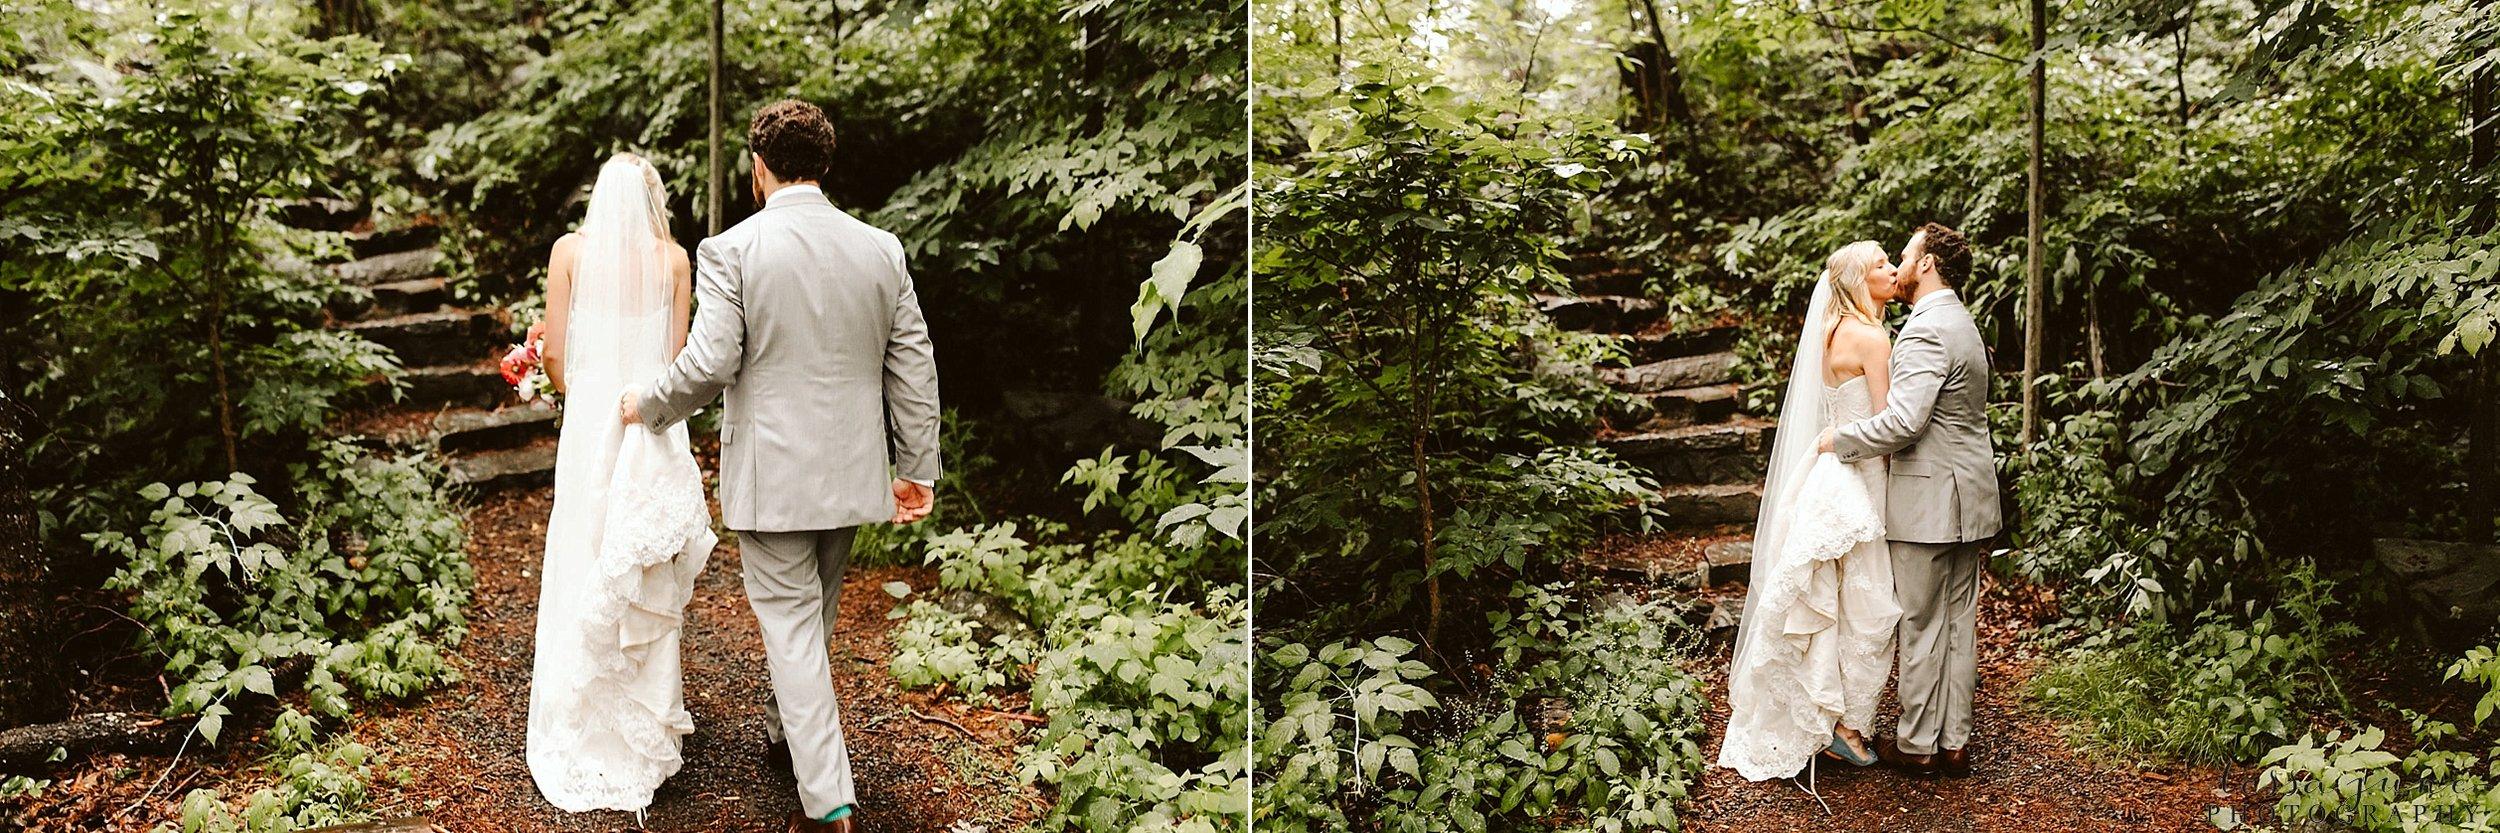 taylors-falls-rainy-elopement-wedding-interstate-state-park-23.jpg